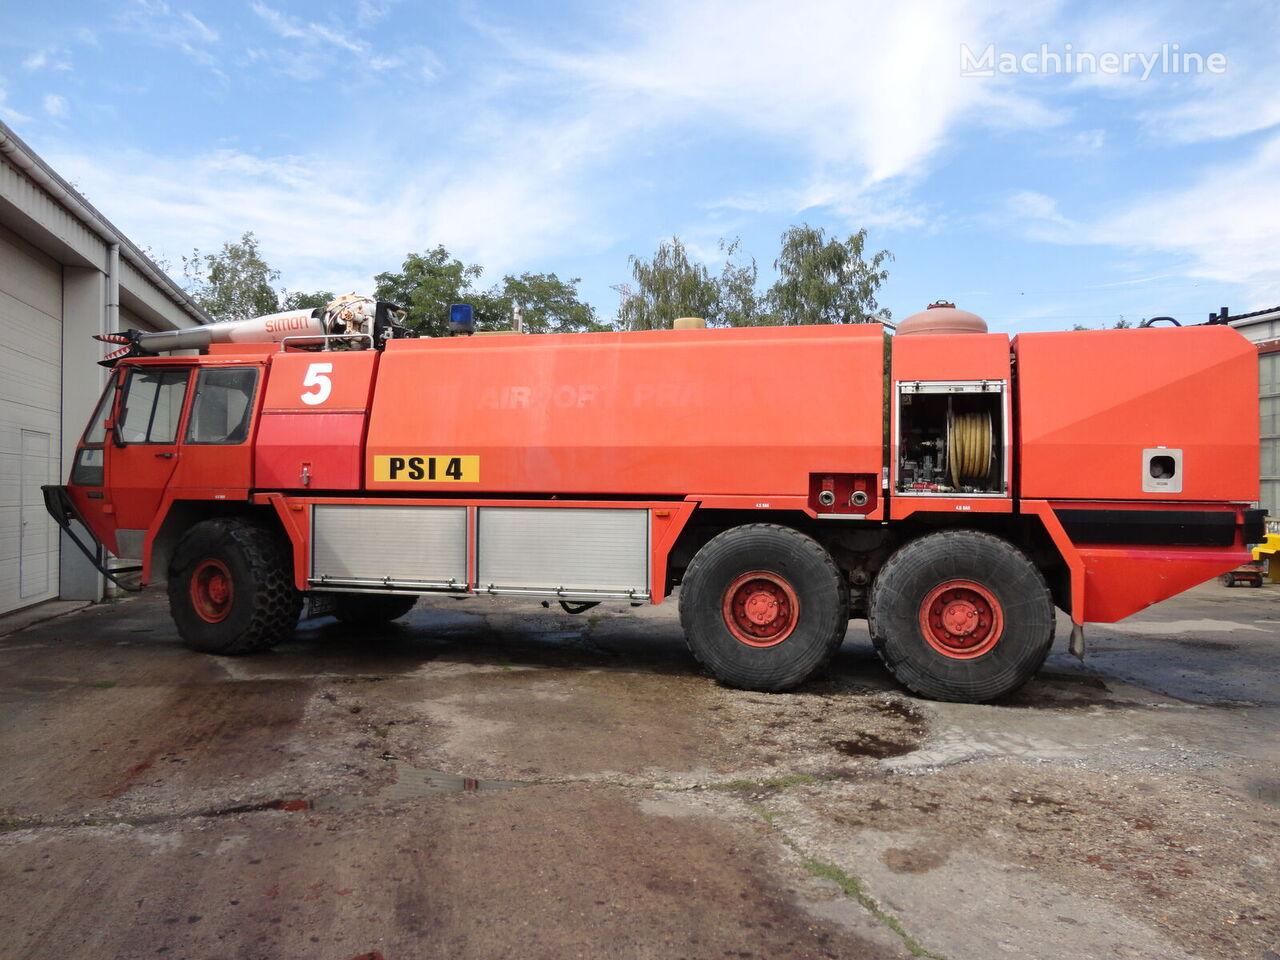 Rosenbauer PROTECTOR C.4. airport fire truck